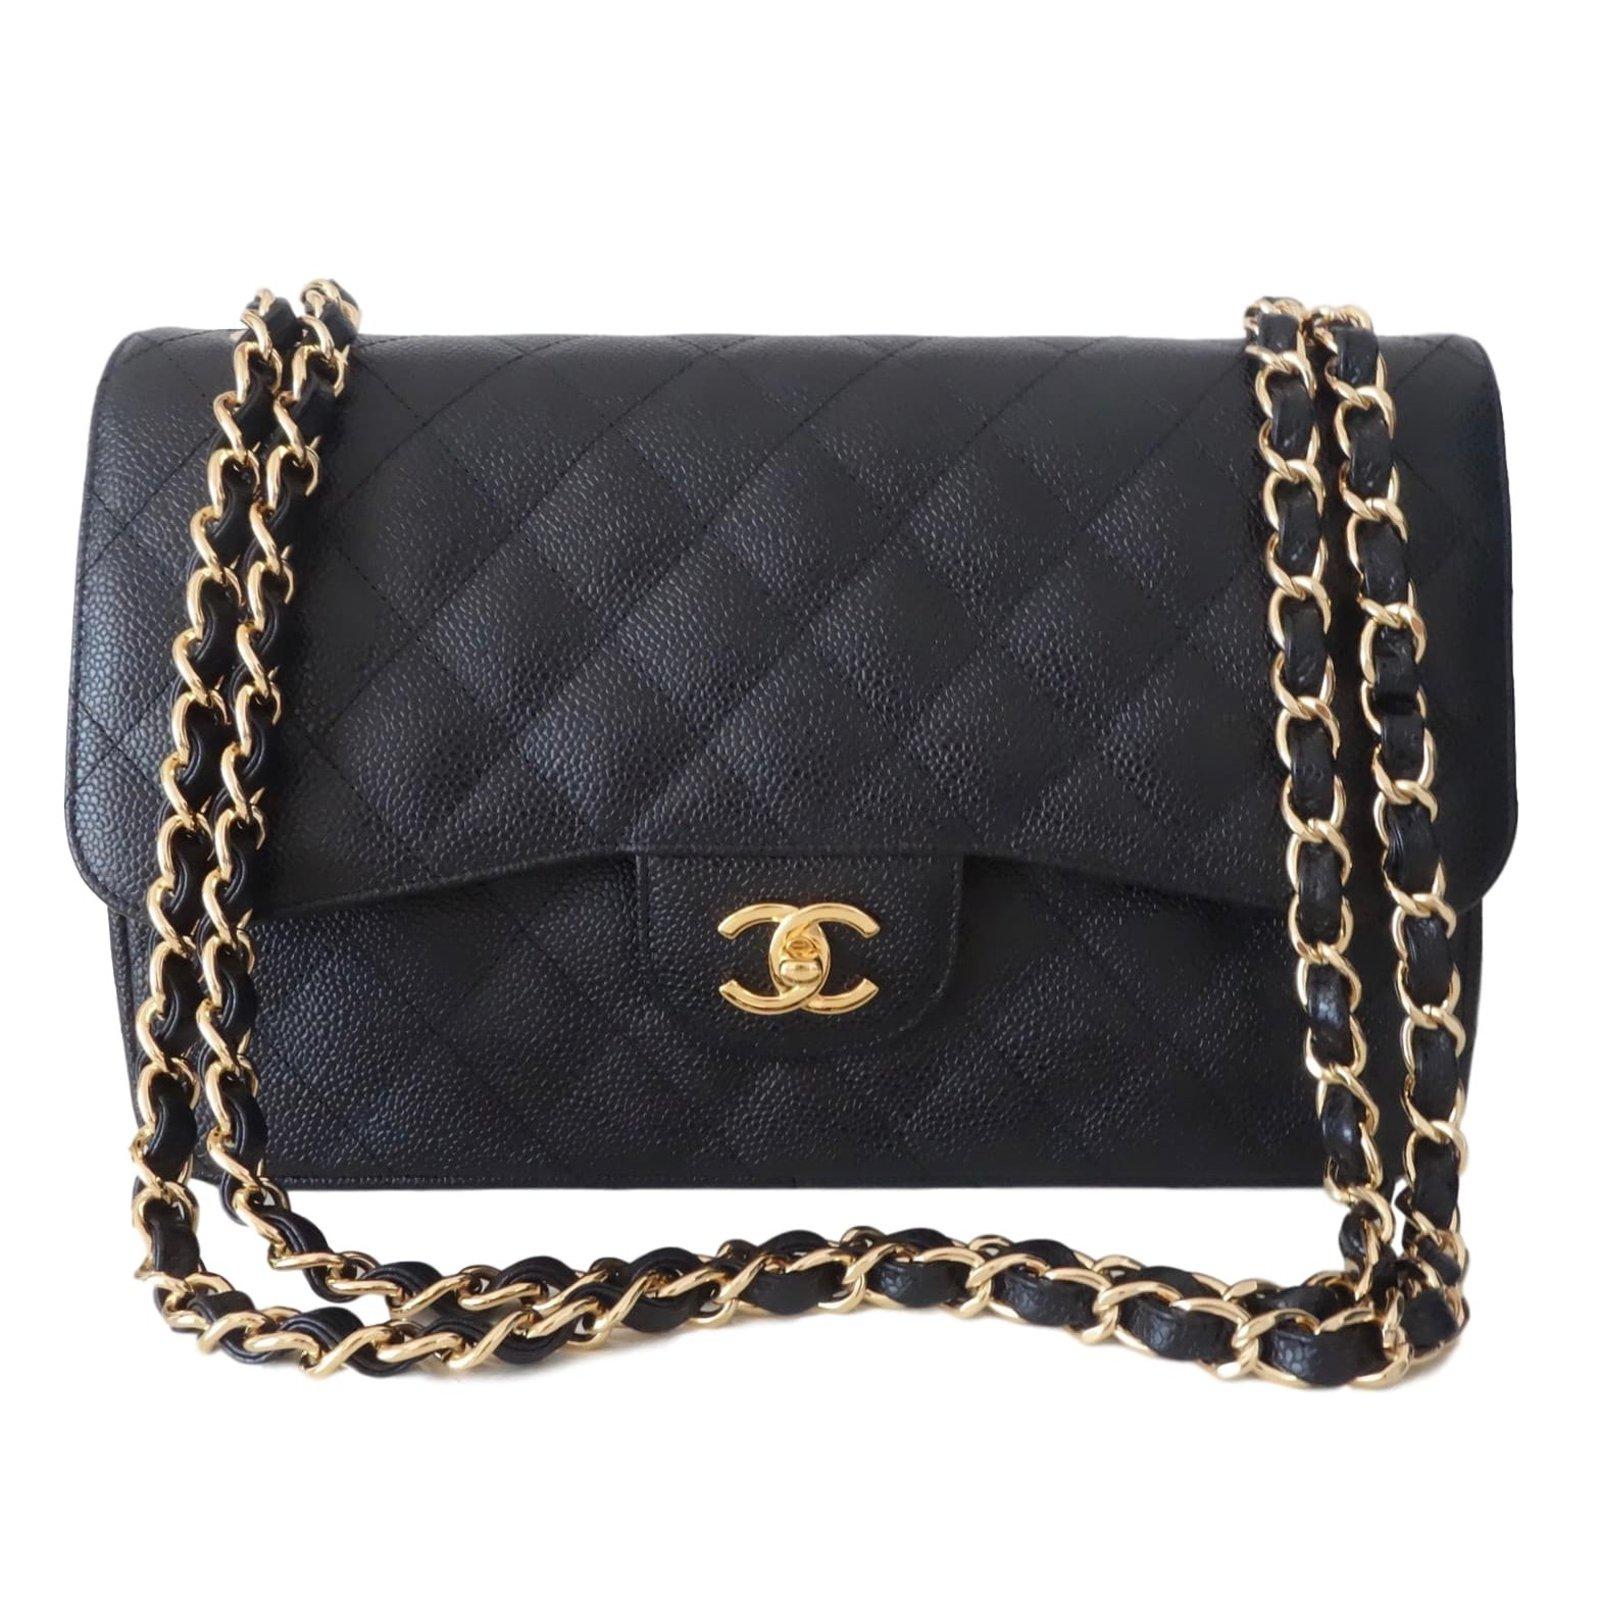 Chanel Chanel Classic GM Caviar leather Handbags Leather Black ref.40361 8db9161114739